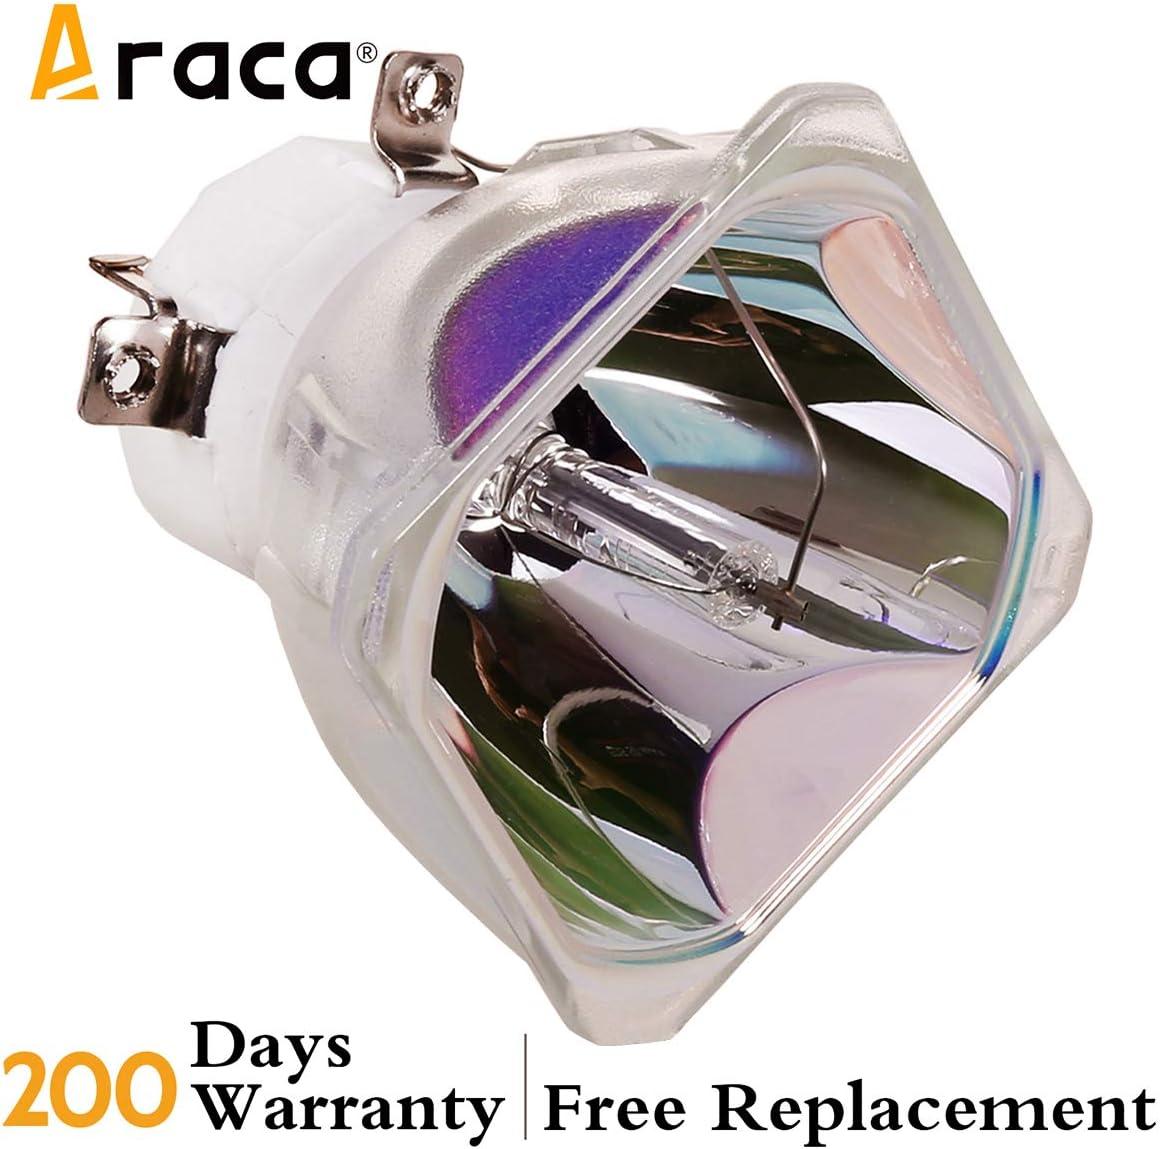 Araca LMP-H230 Projector Bare Lamp for Sony VPL-VW350ES VPL-VW300ES VPL-VW67ES Quality Lamp Replacement Projector Lamp